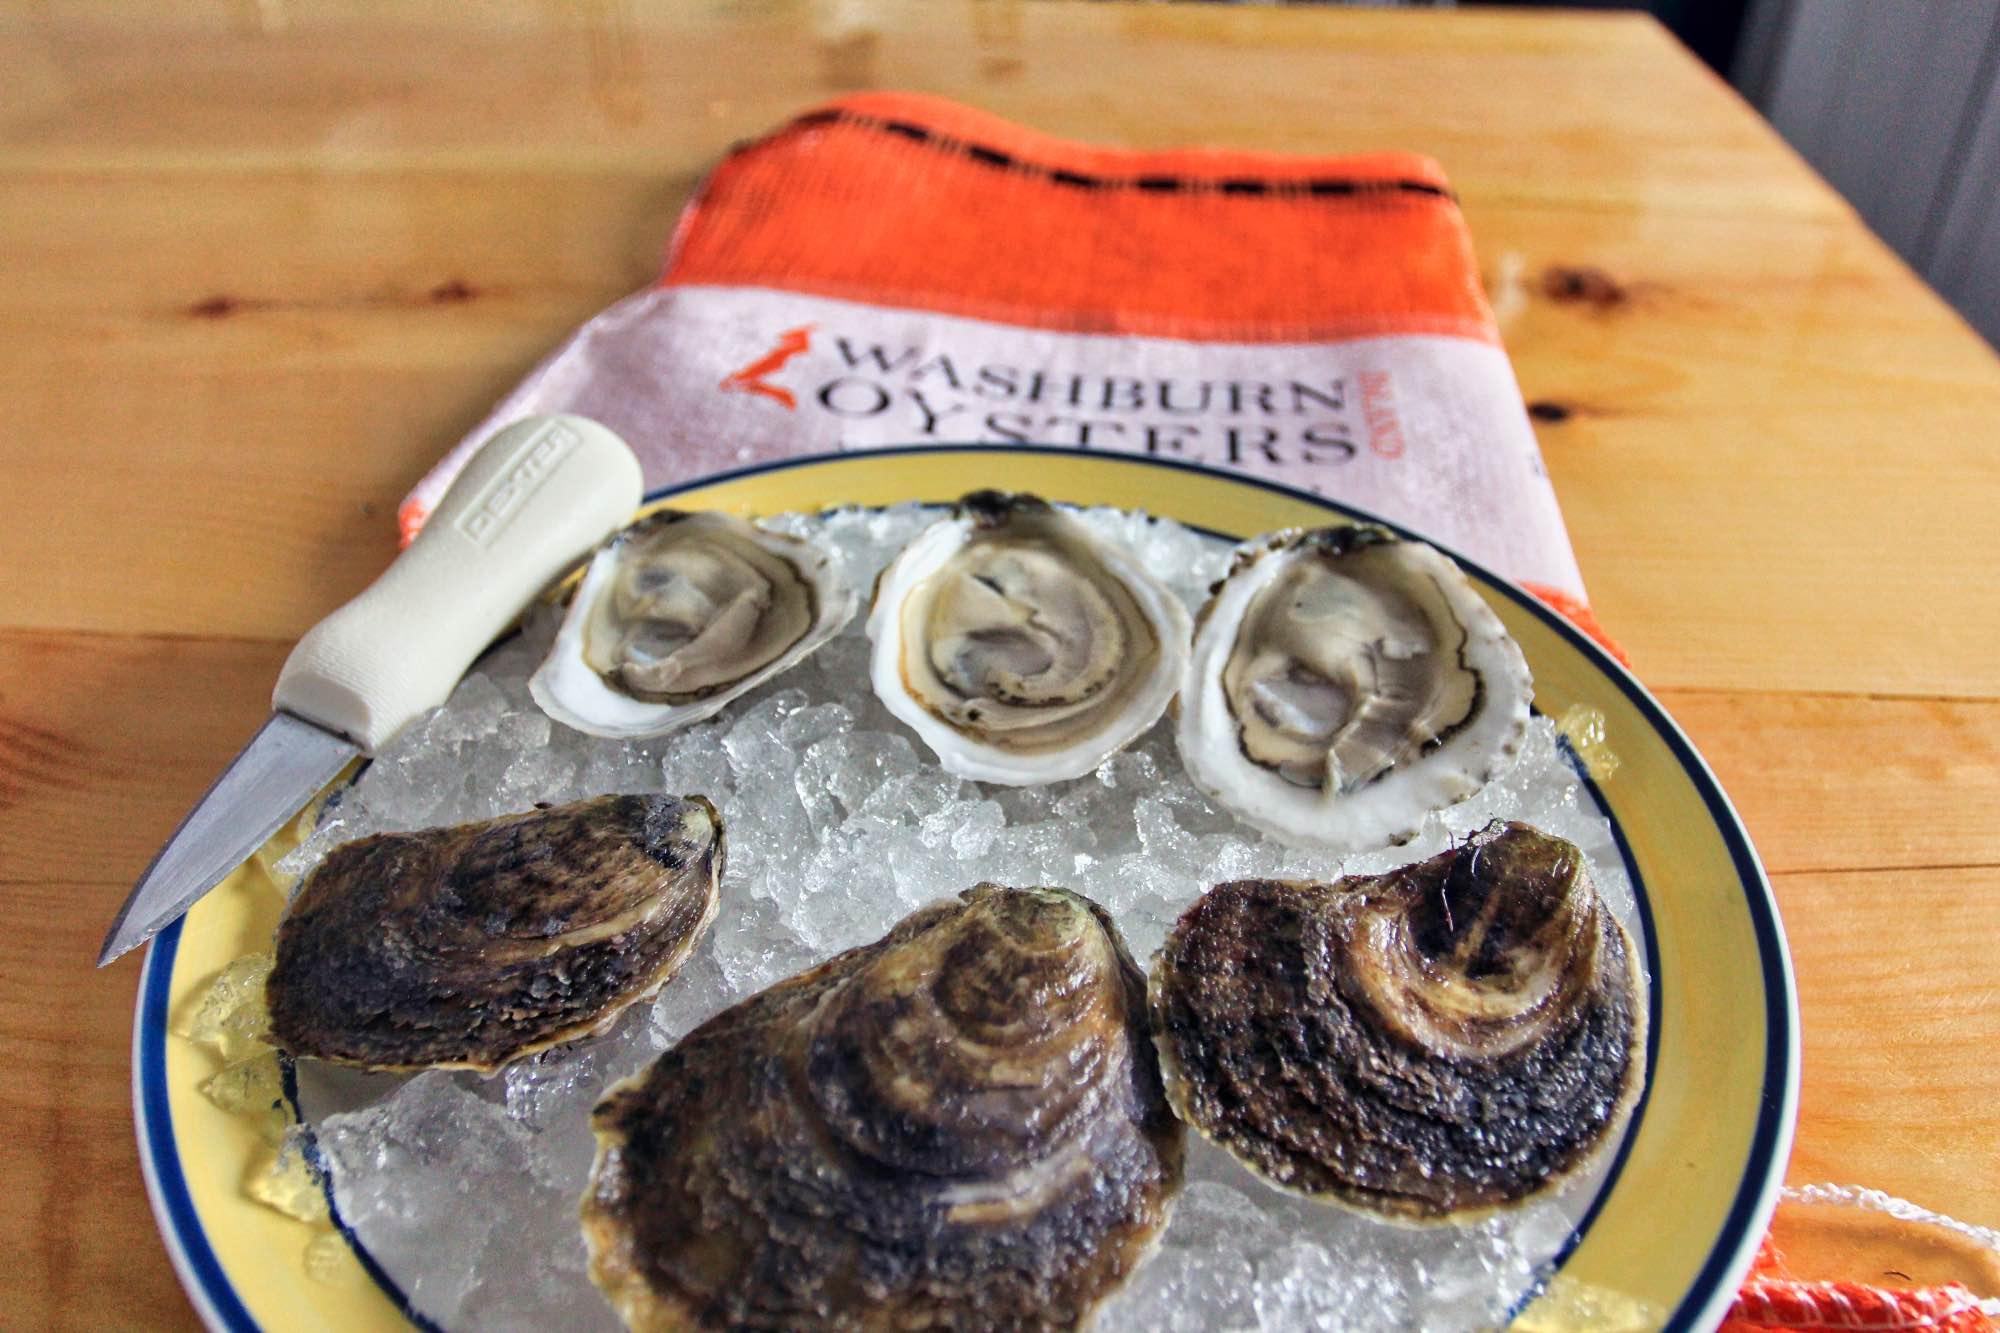 Washburn Island Oysters